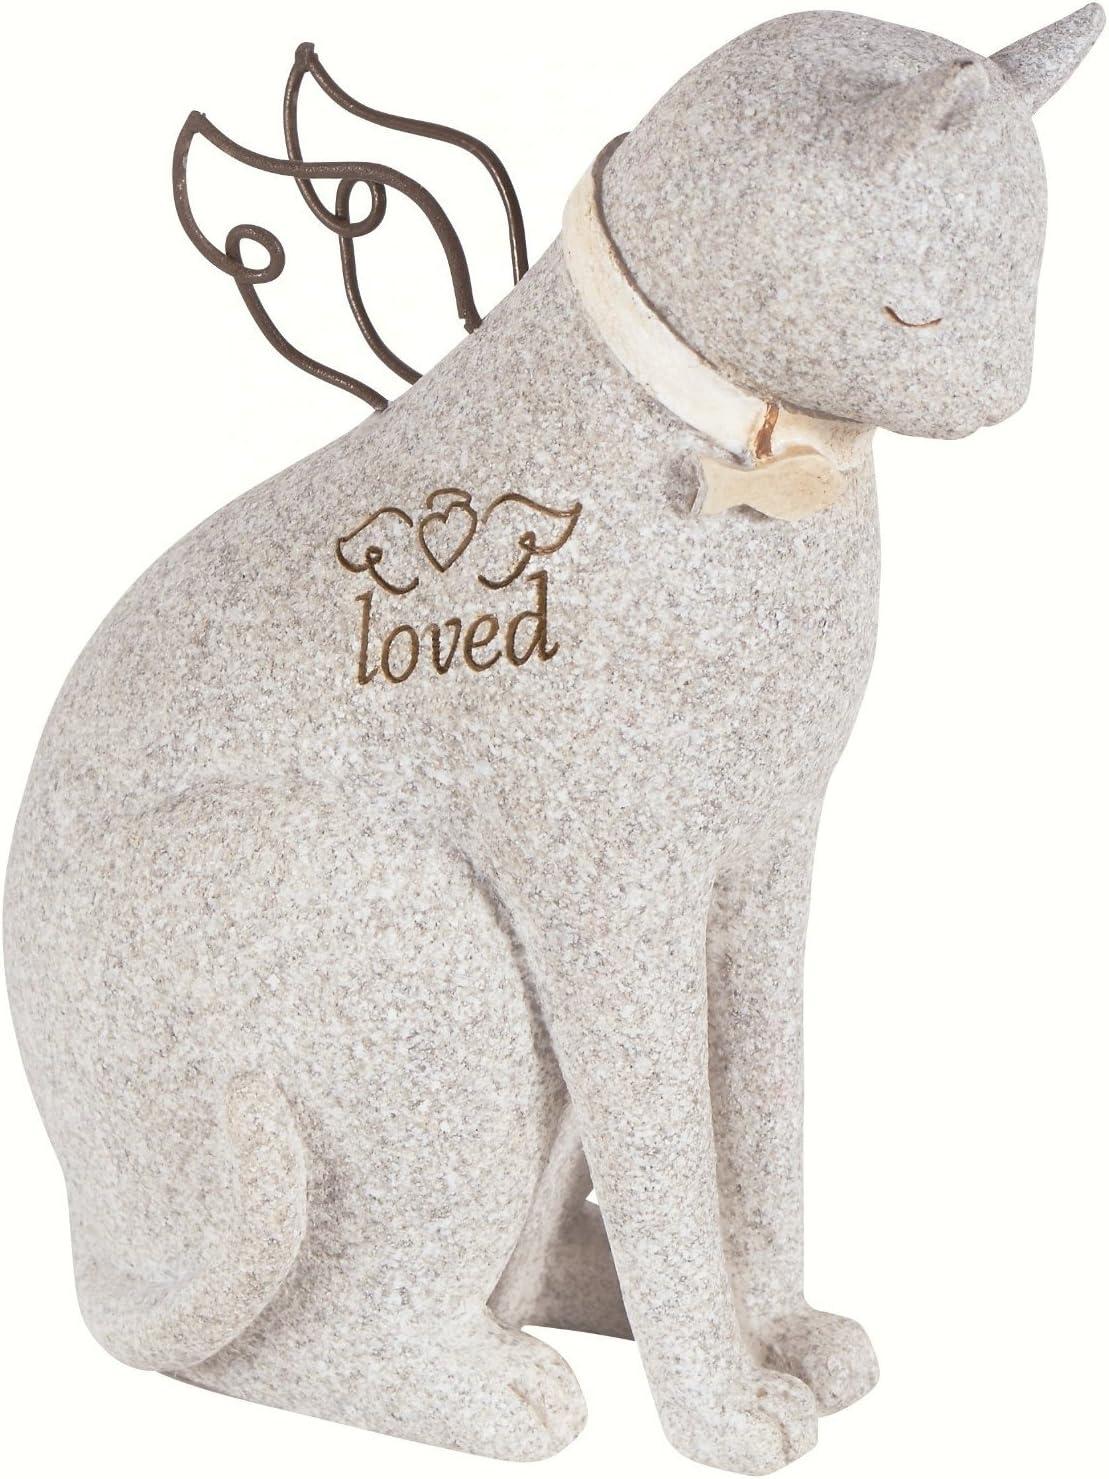 Carson Bereavement Faithful Angel by Robin Davis Cat Figurine